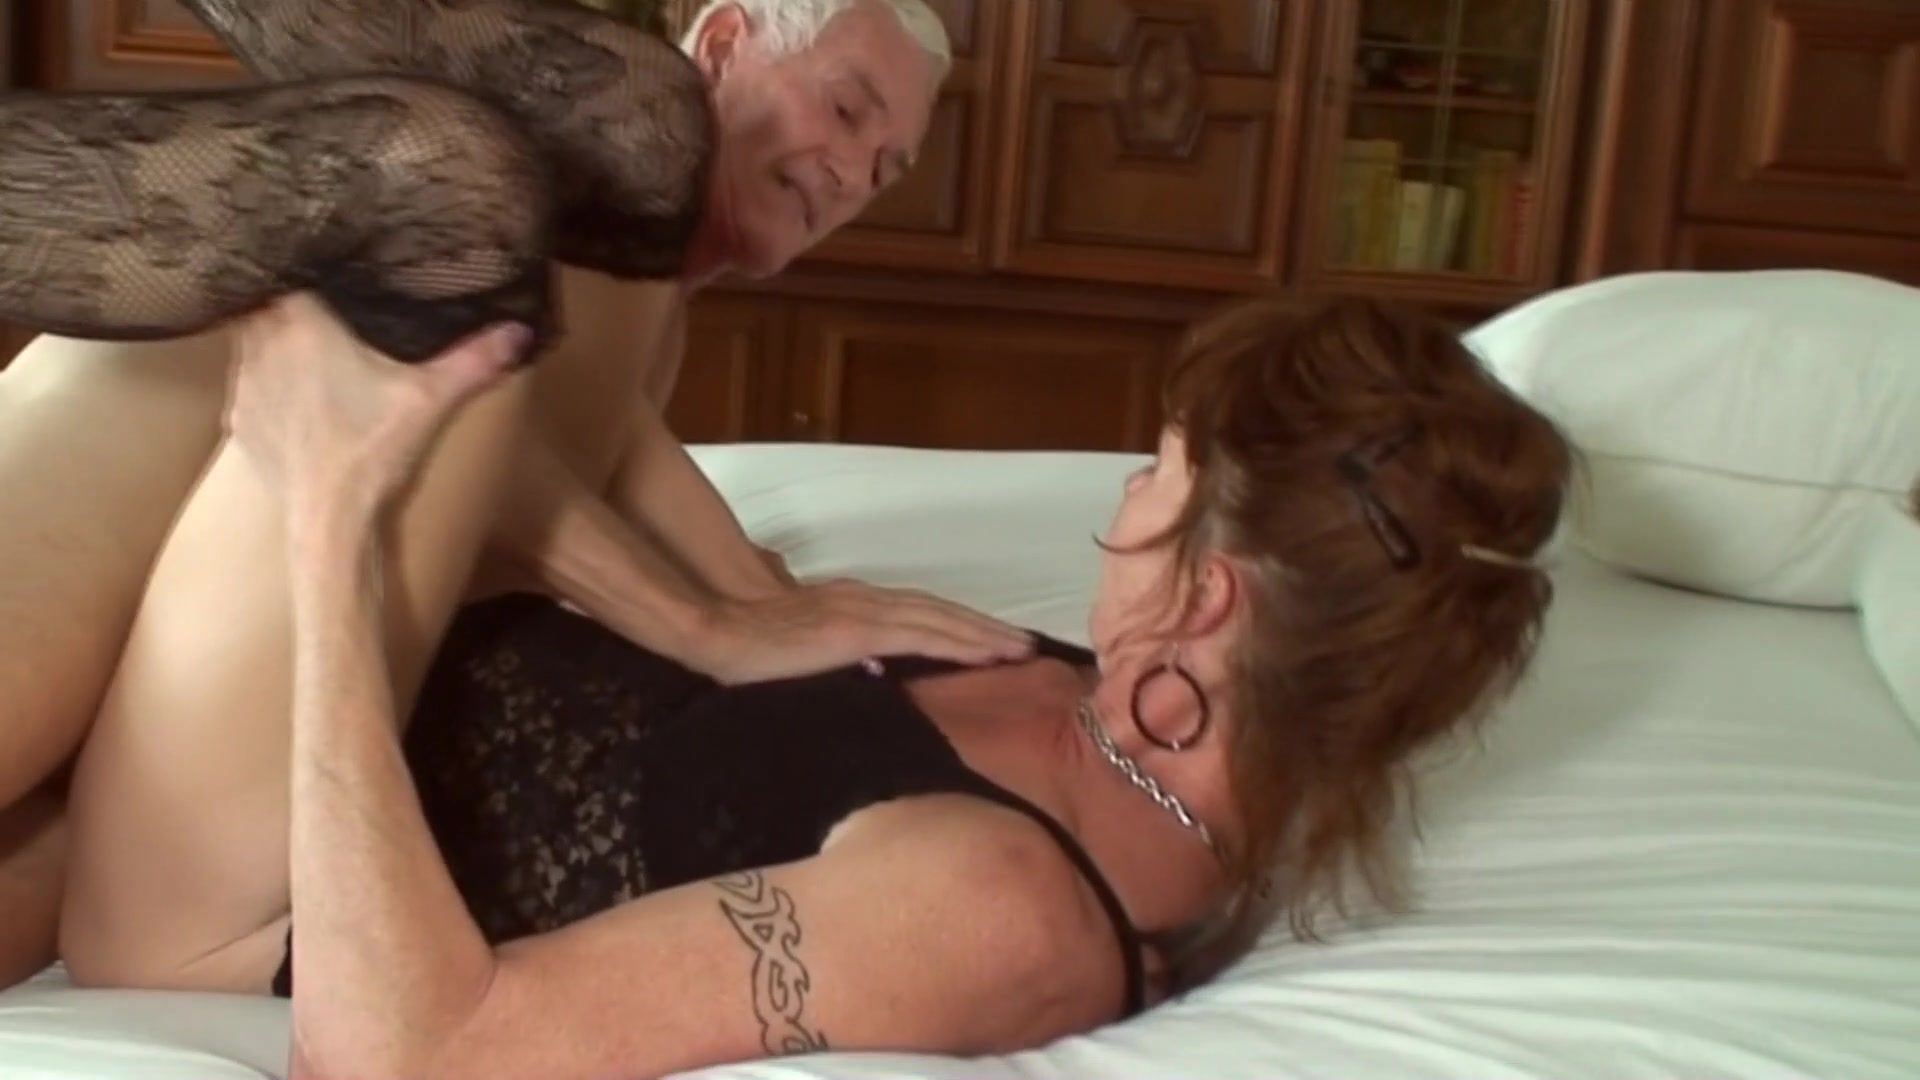 Topic Adult escort las vegas remarkable, useful